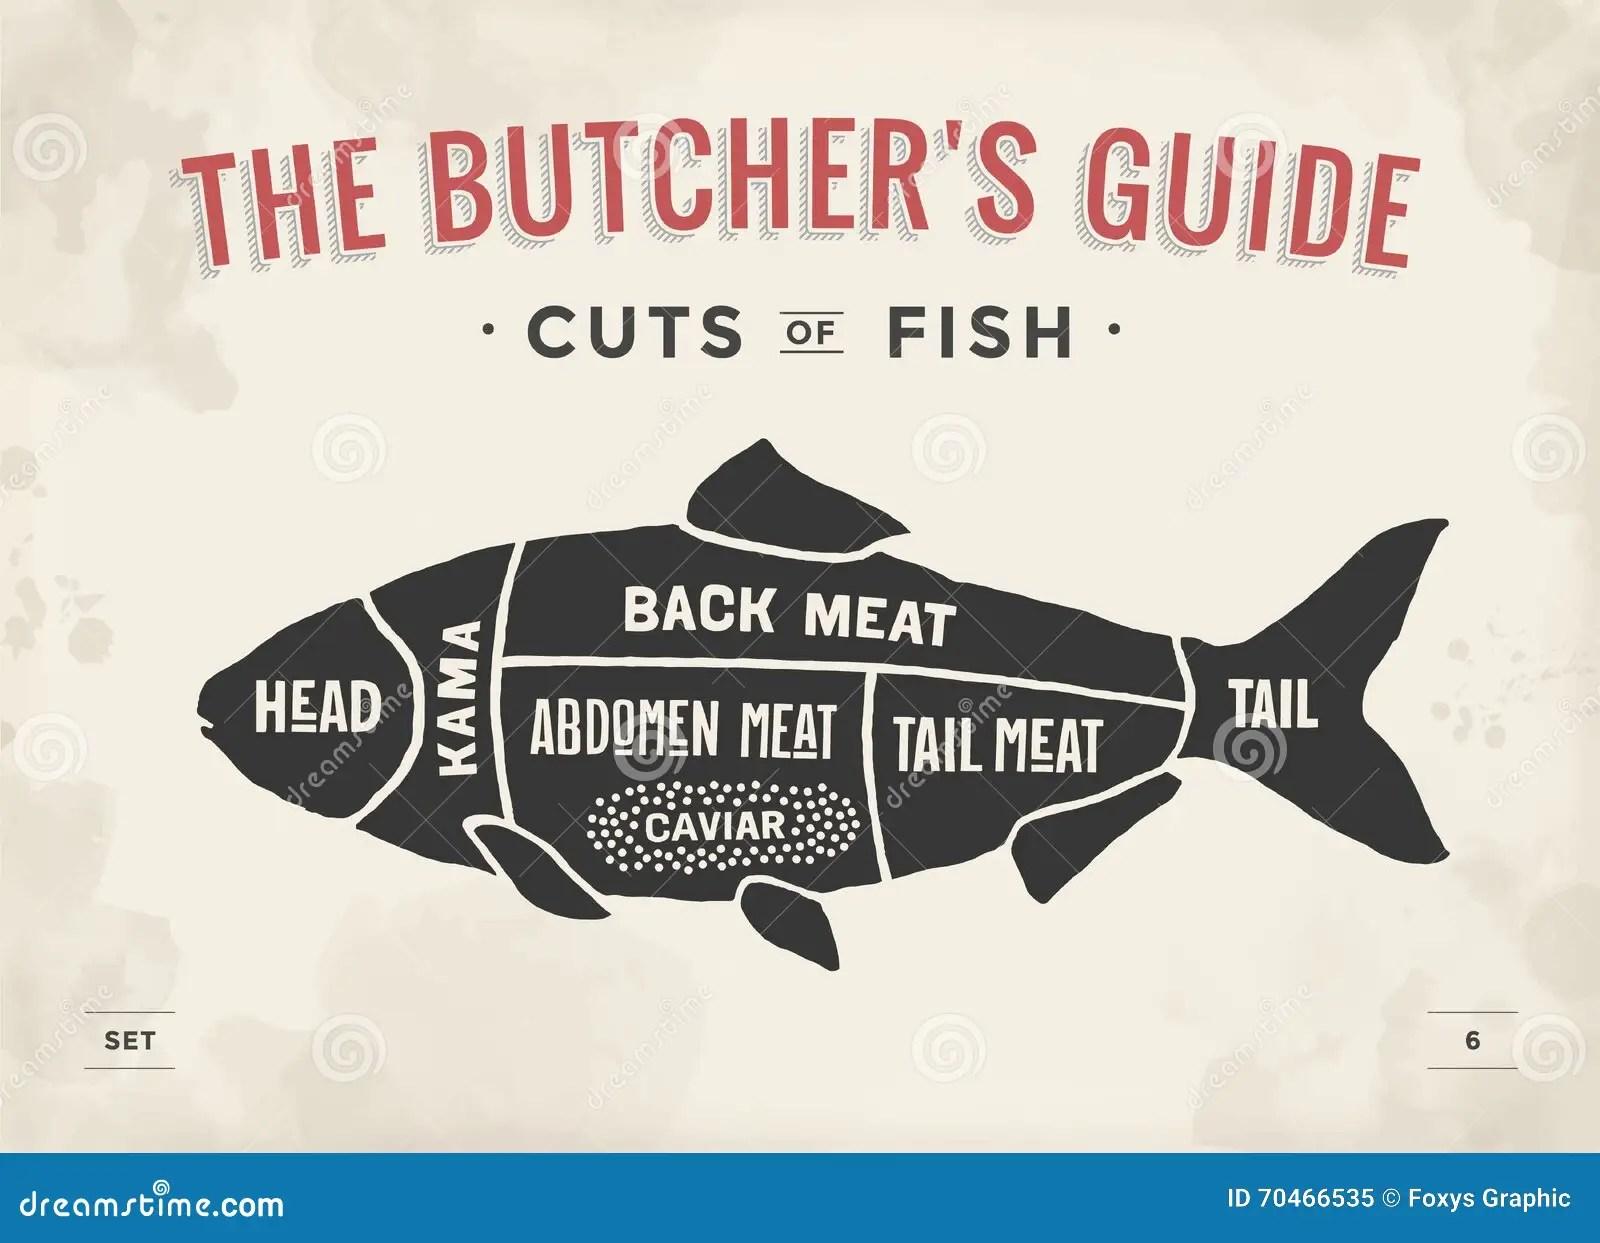 kitchen art prints pig 肉块集合海报屠户图和计划 鱼葡萄酒印刷手拉向量例证 插画包括有厨师 鱼葡萄酒印刷手拉